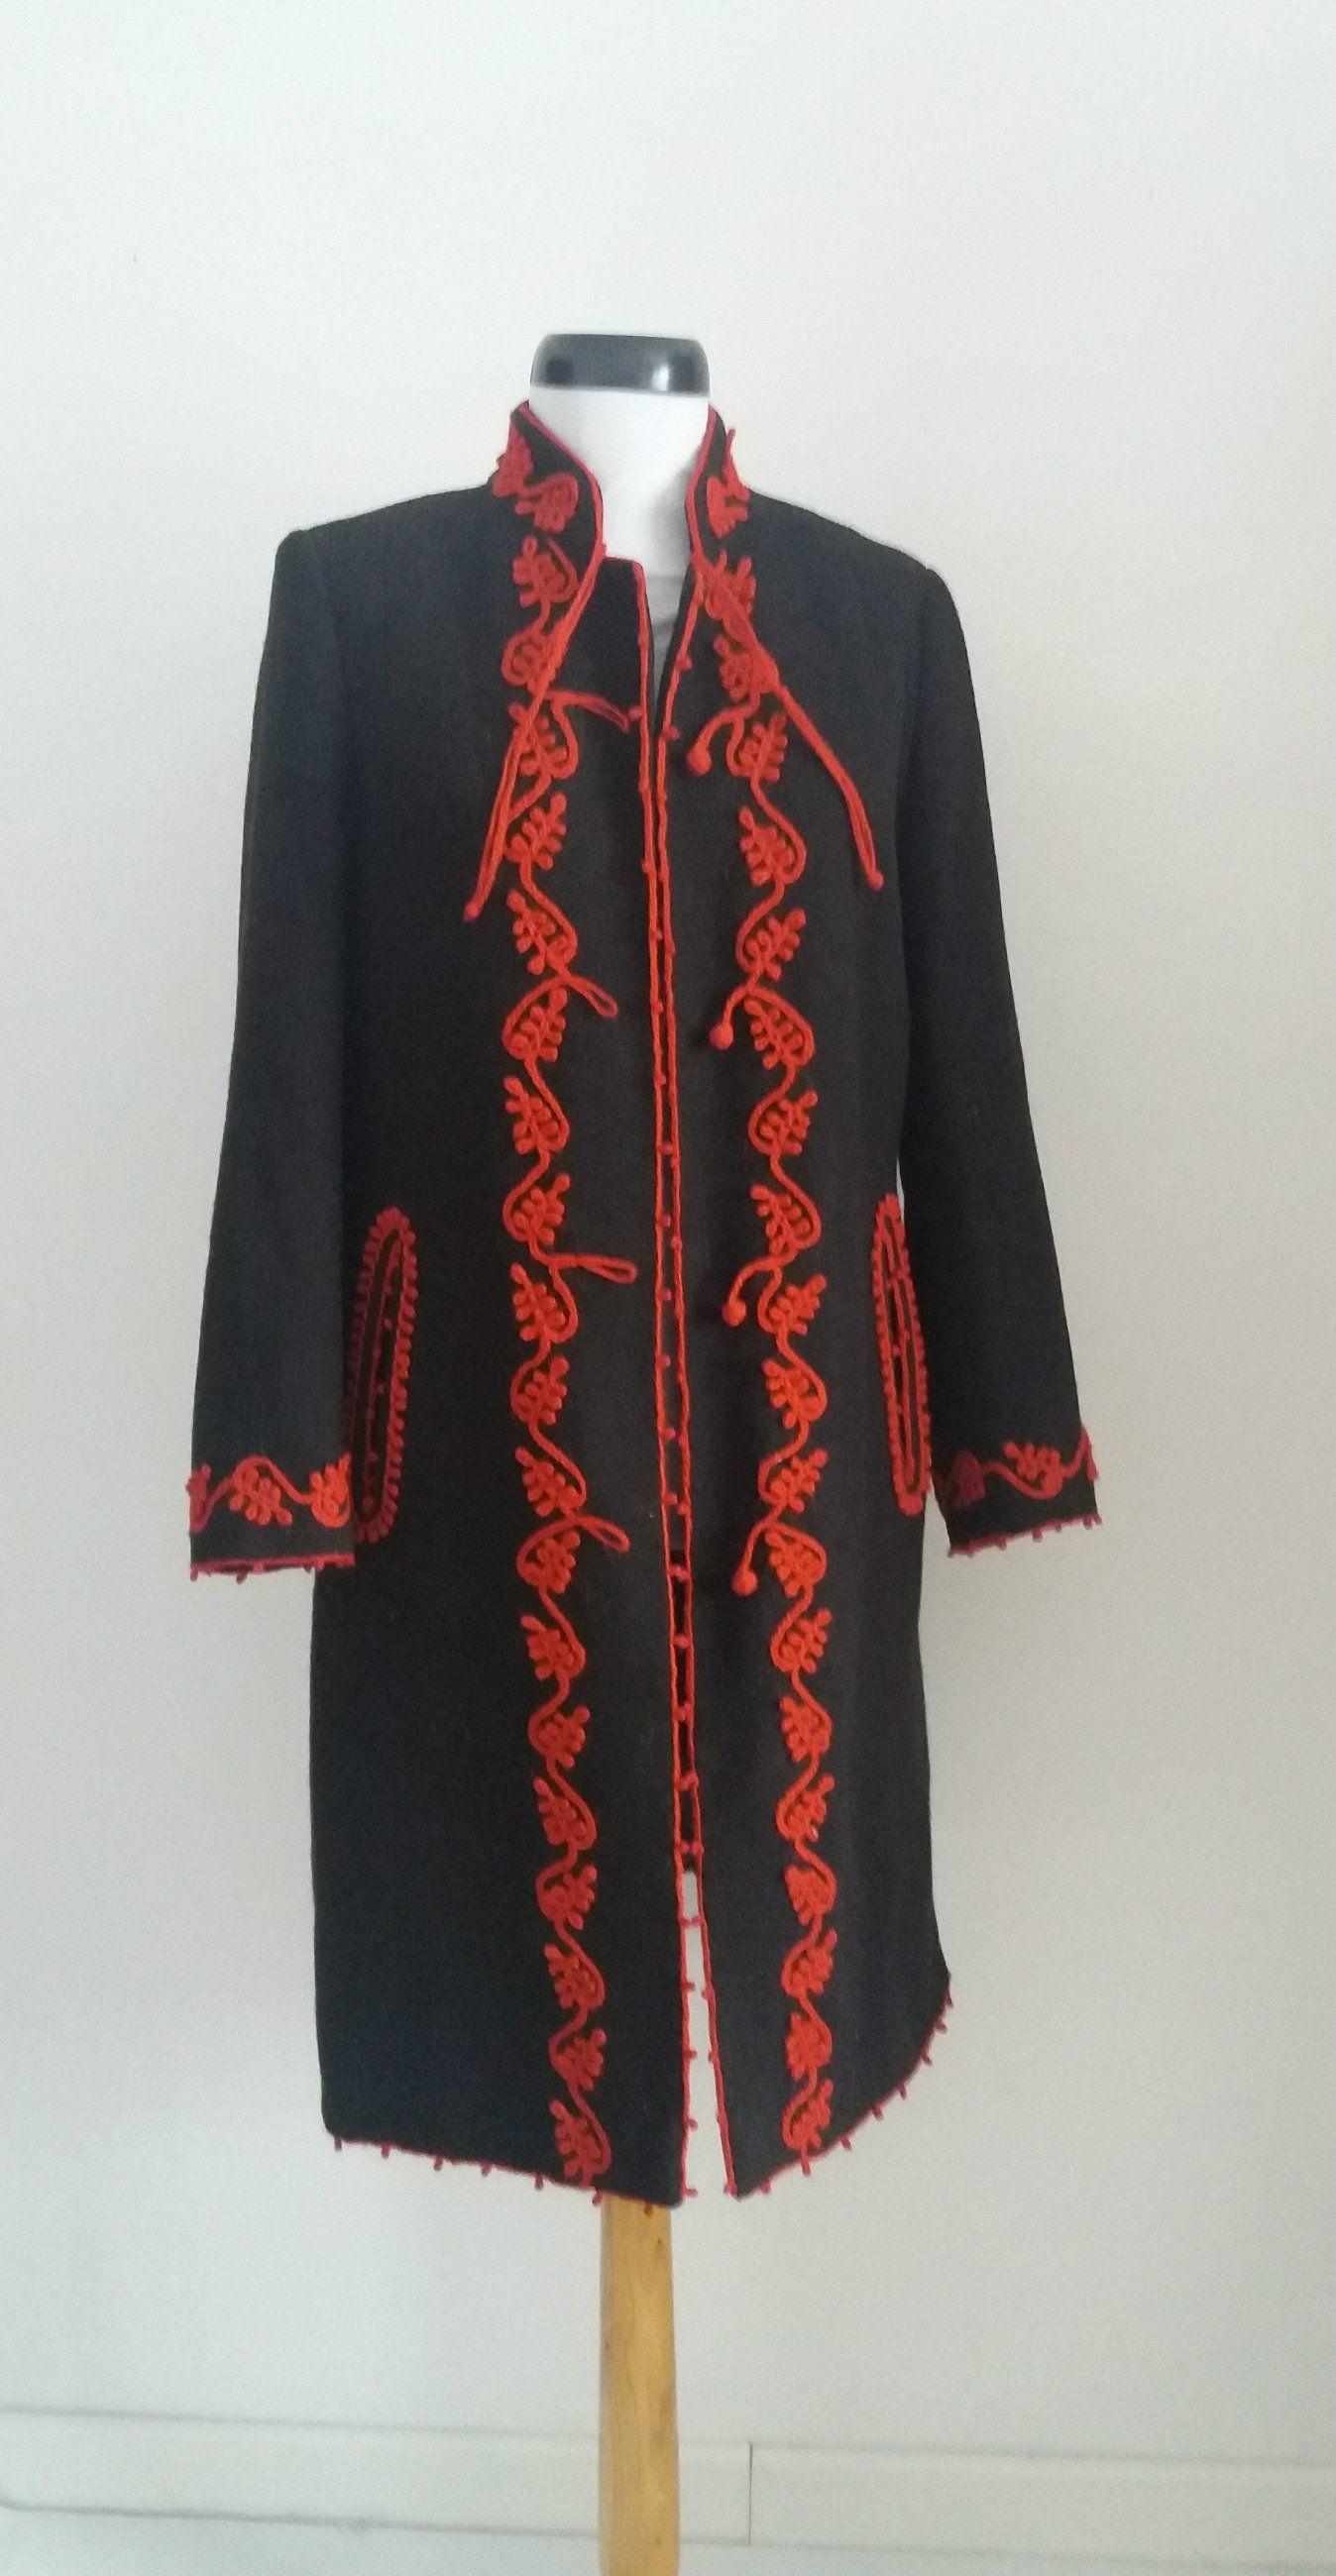 Vintage 1920s handmade traditionale coat / 1920s black